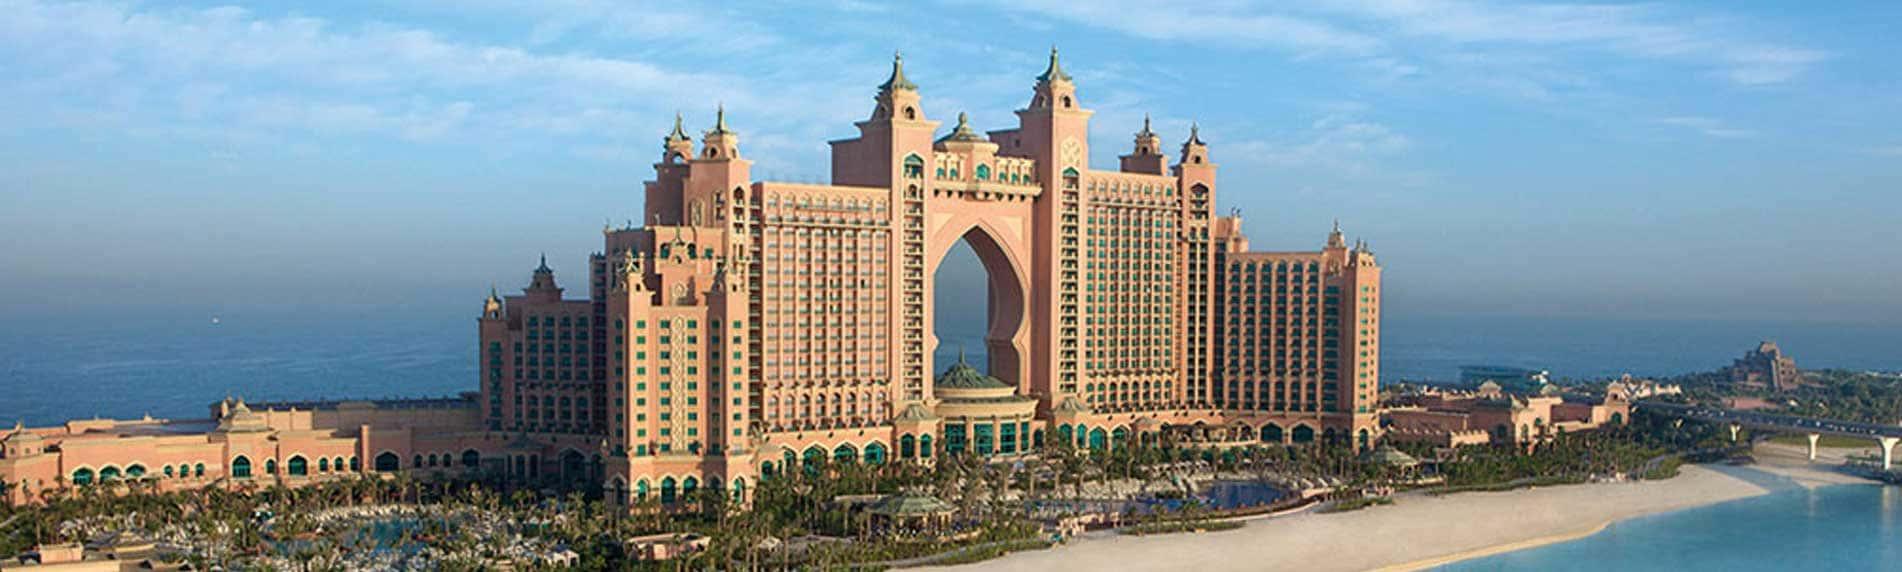 Magical Moments 4 Nights Dubai